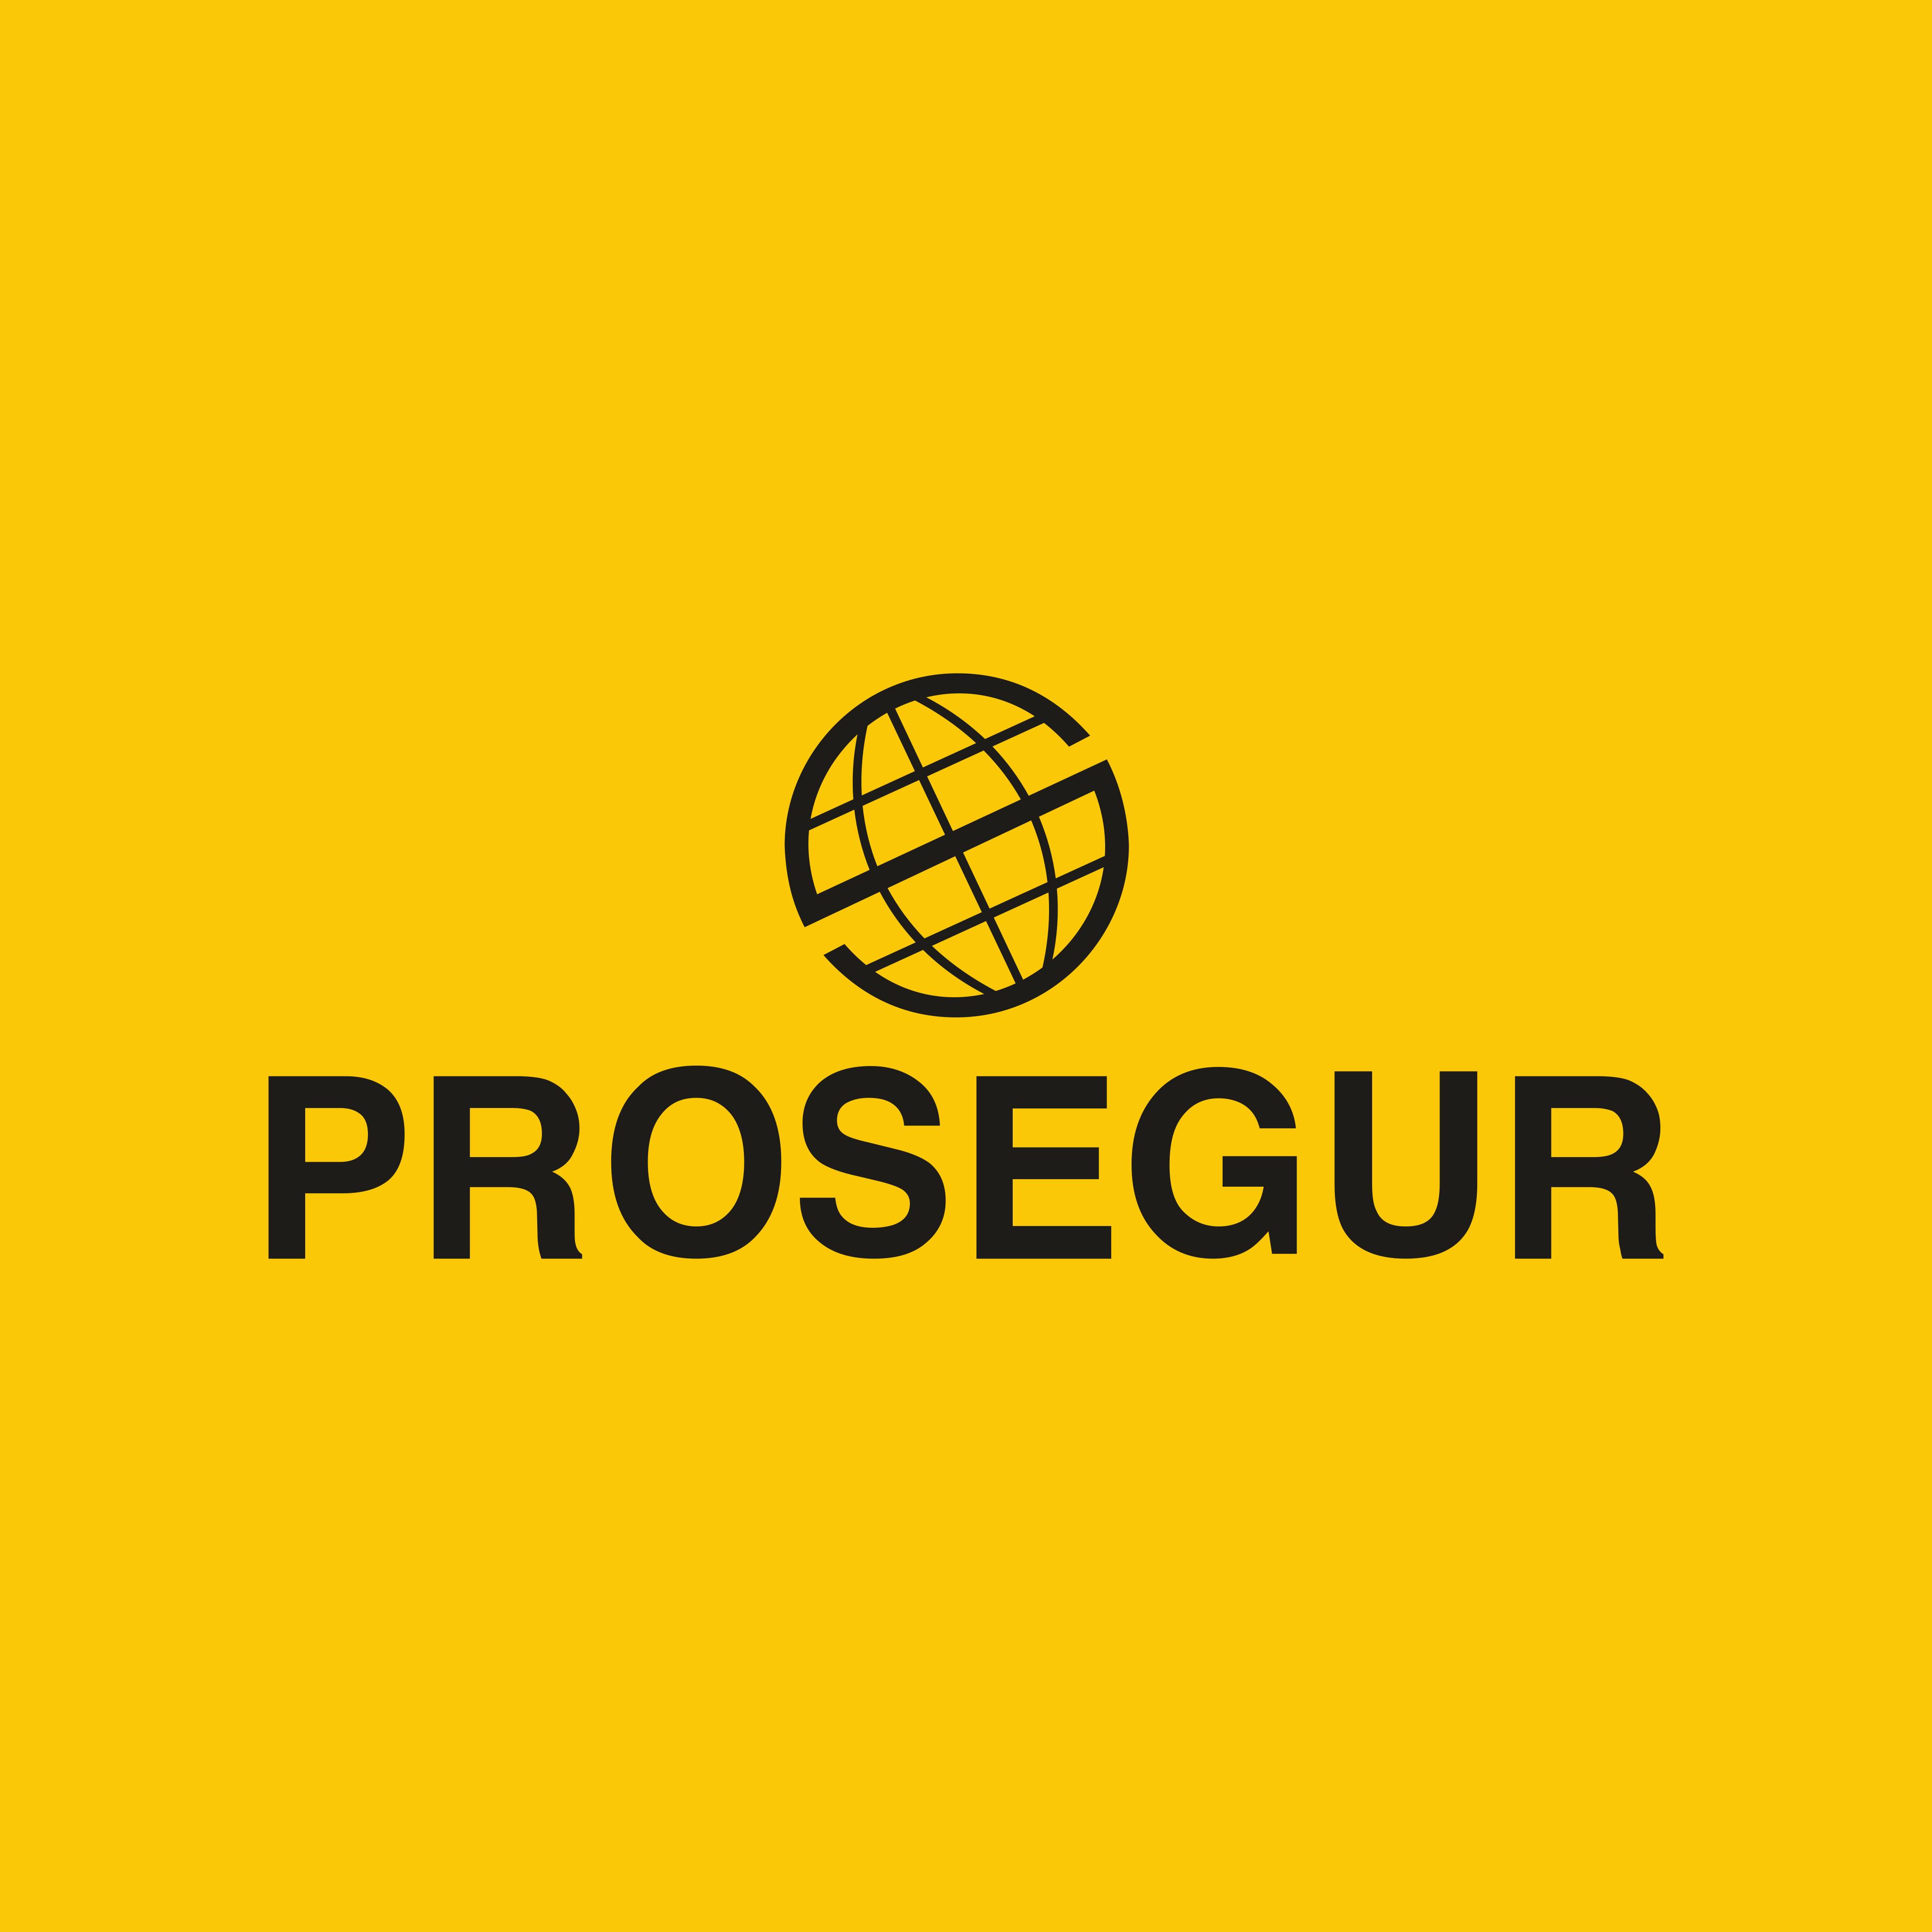 prosegur logo 0 - Prosegur Logo